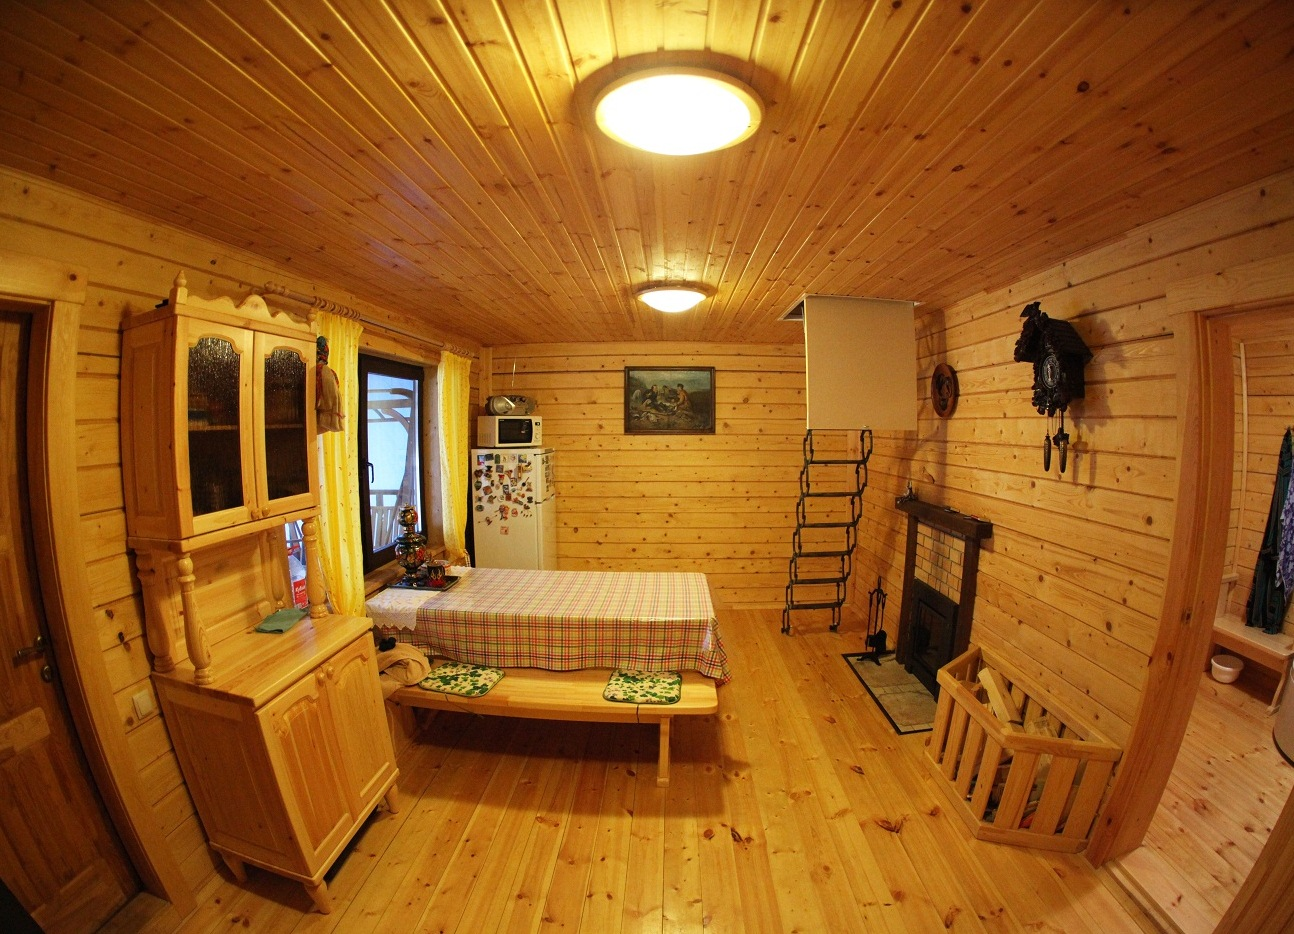 Комната для отдыха своими руками